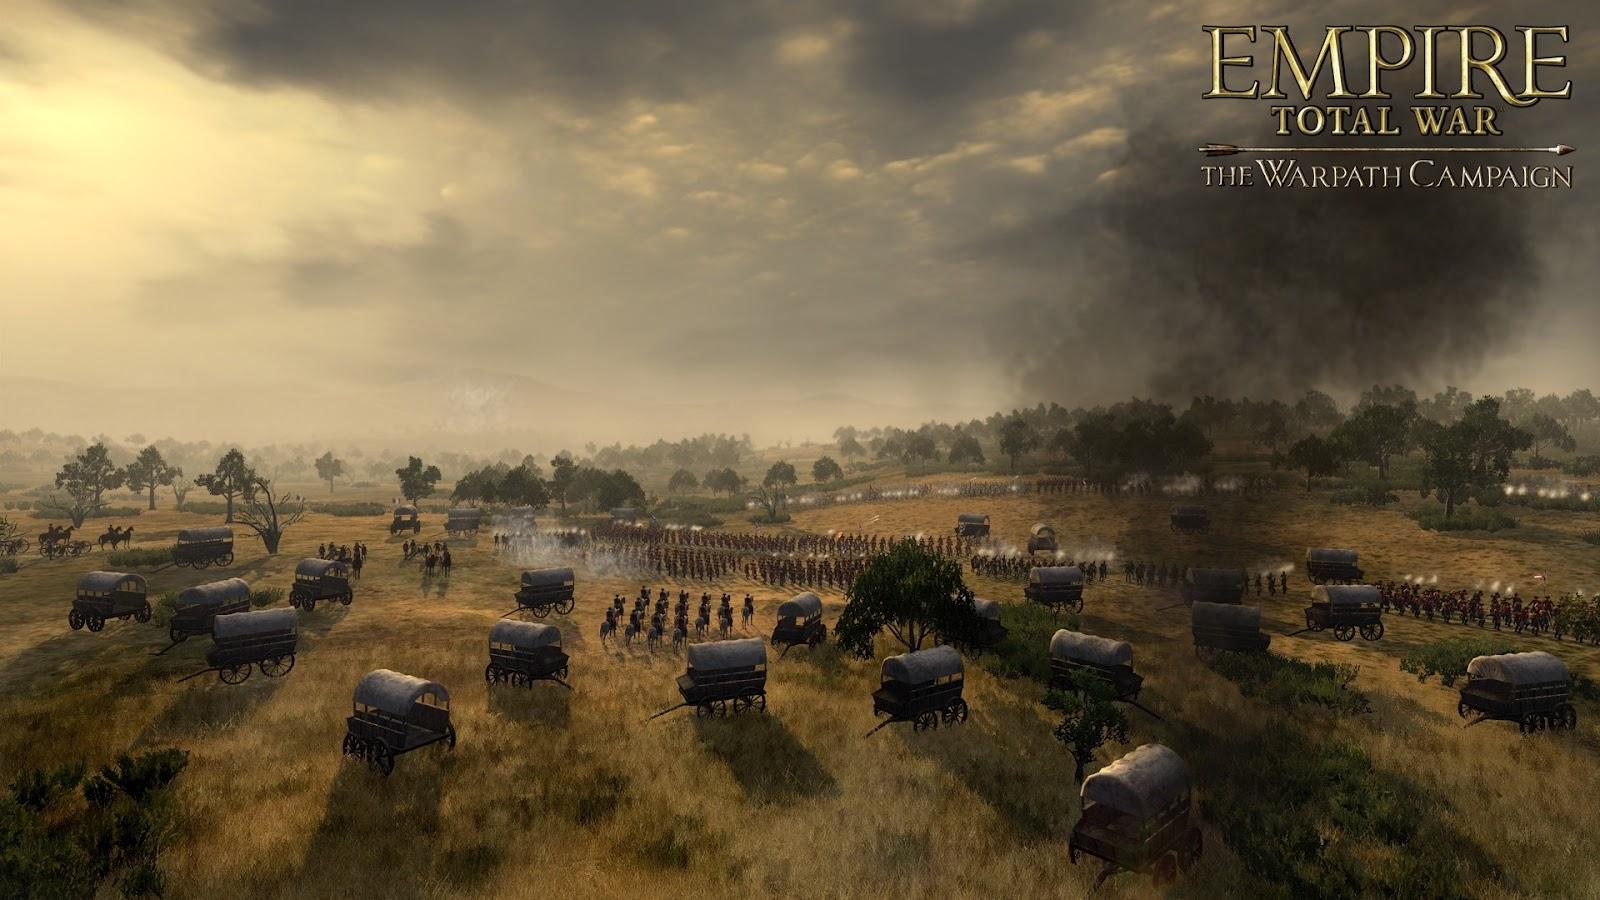 Empire Total war Wallpaper 2 1920x1080 1600x900